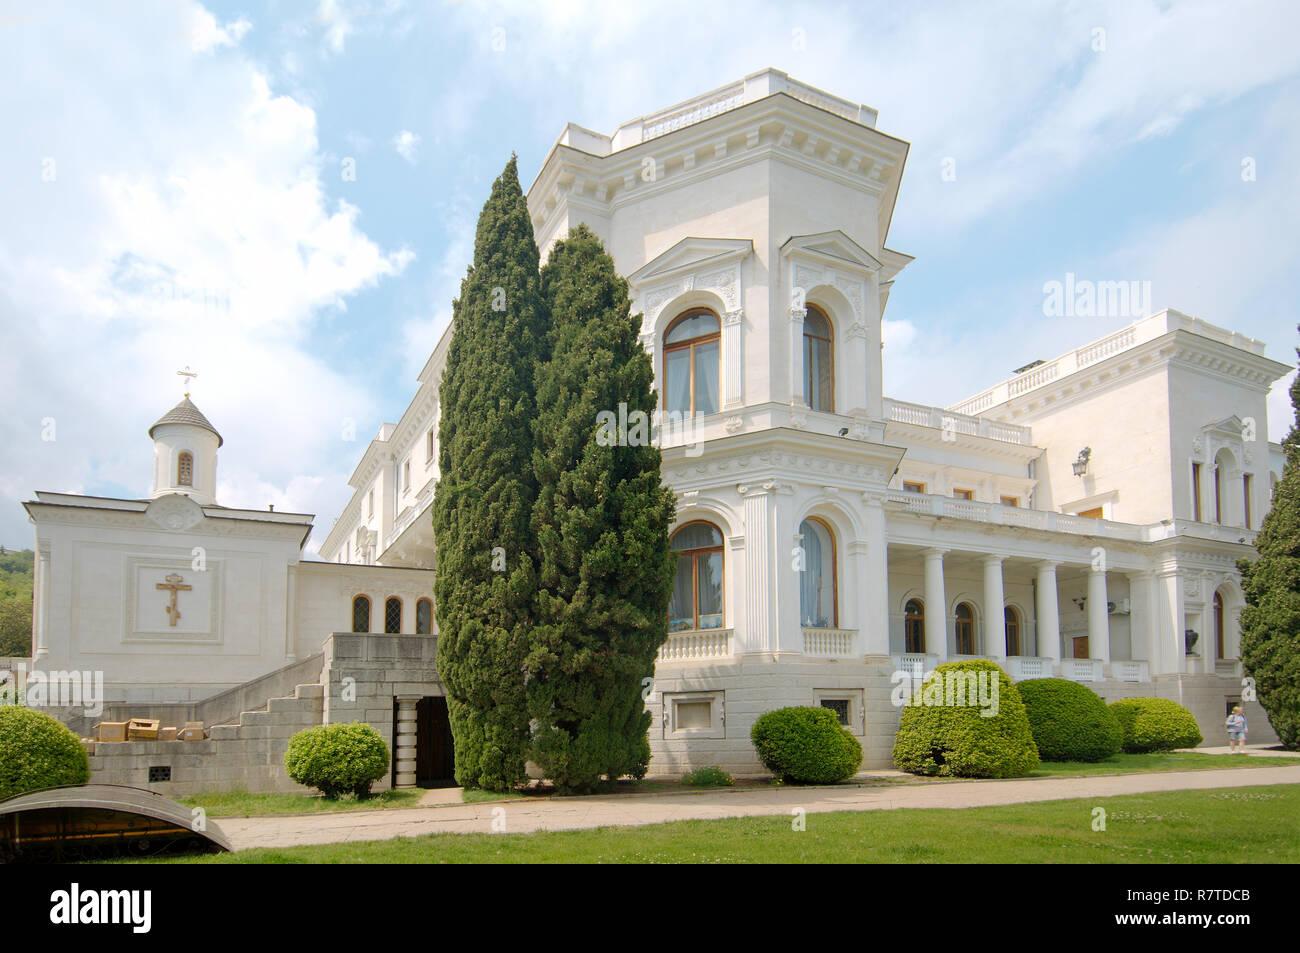 Livadia Palace, Livadiya, Yalta, Crimea, Ukraine - Stock Image